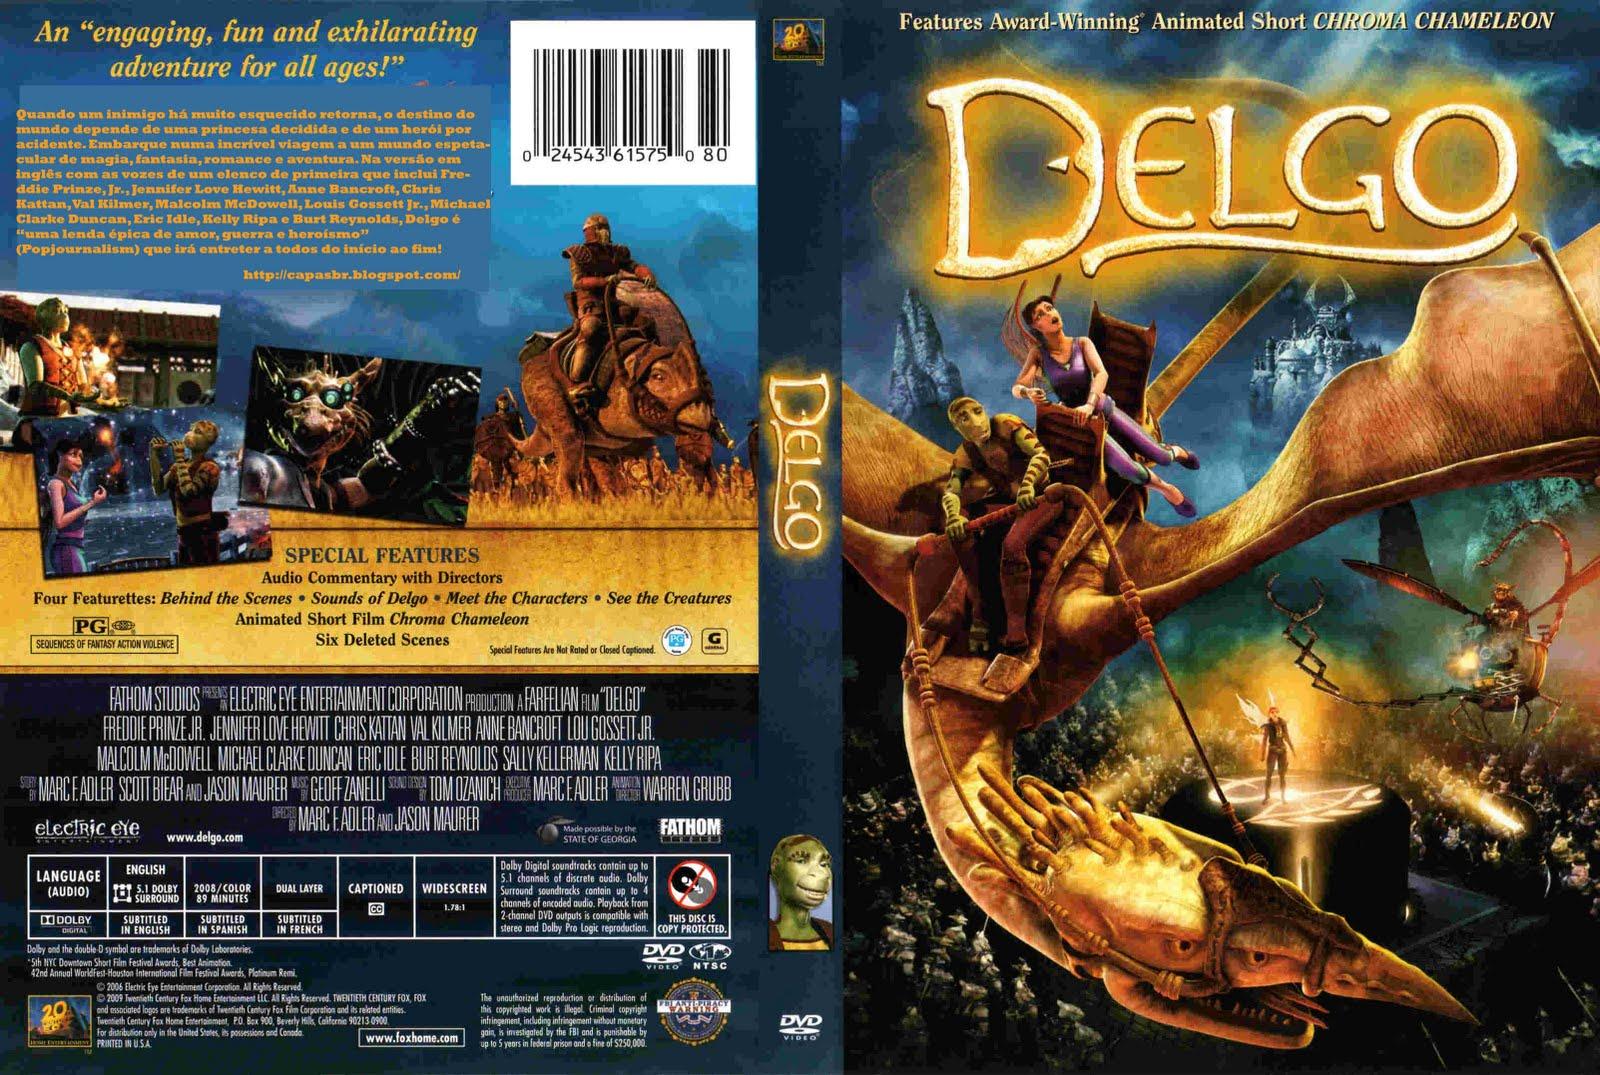 http://3.bp.blogspot.com/_d6xvEECraP0/TCDlTD4AewI/AAAAAAAAAOA/zmPlZ6_wJVA/s1600/Delgo+-+capasbr.jpg